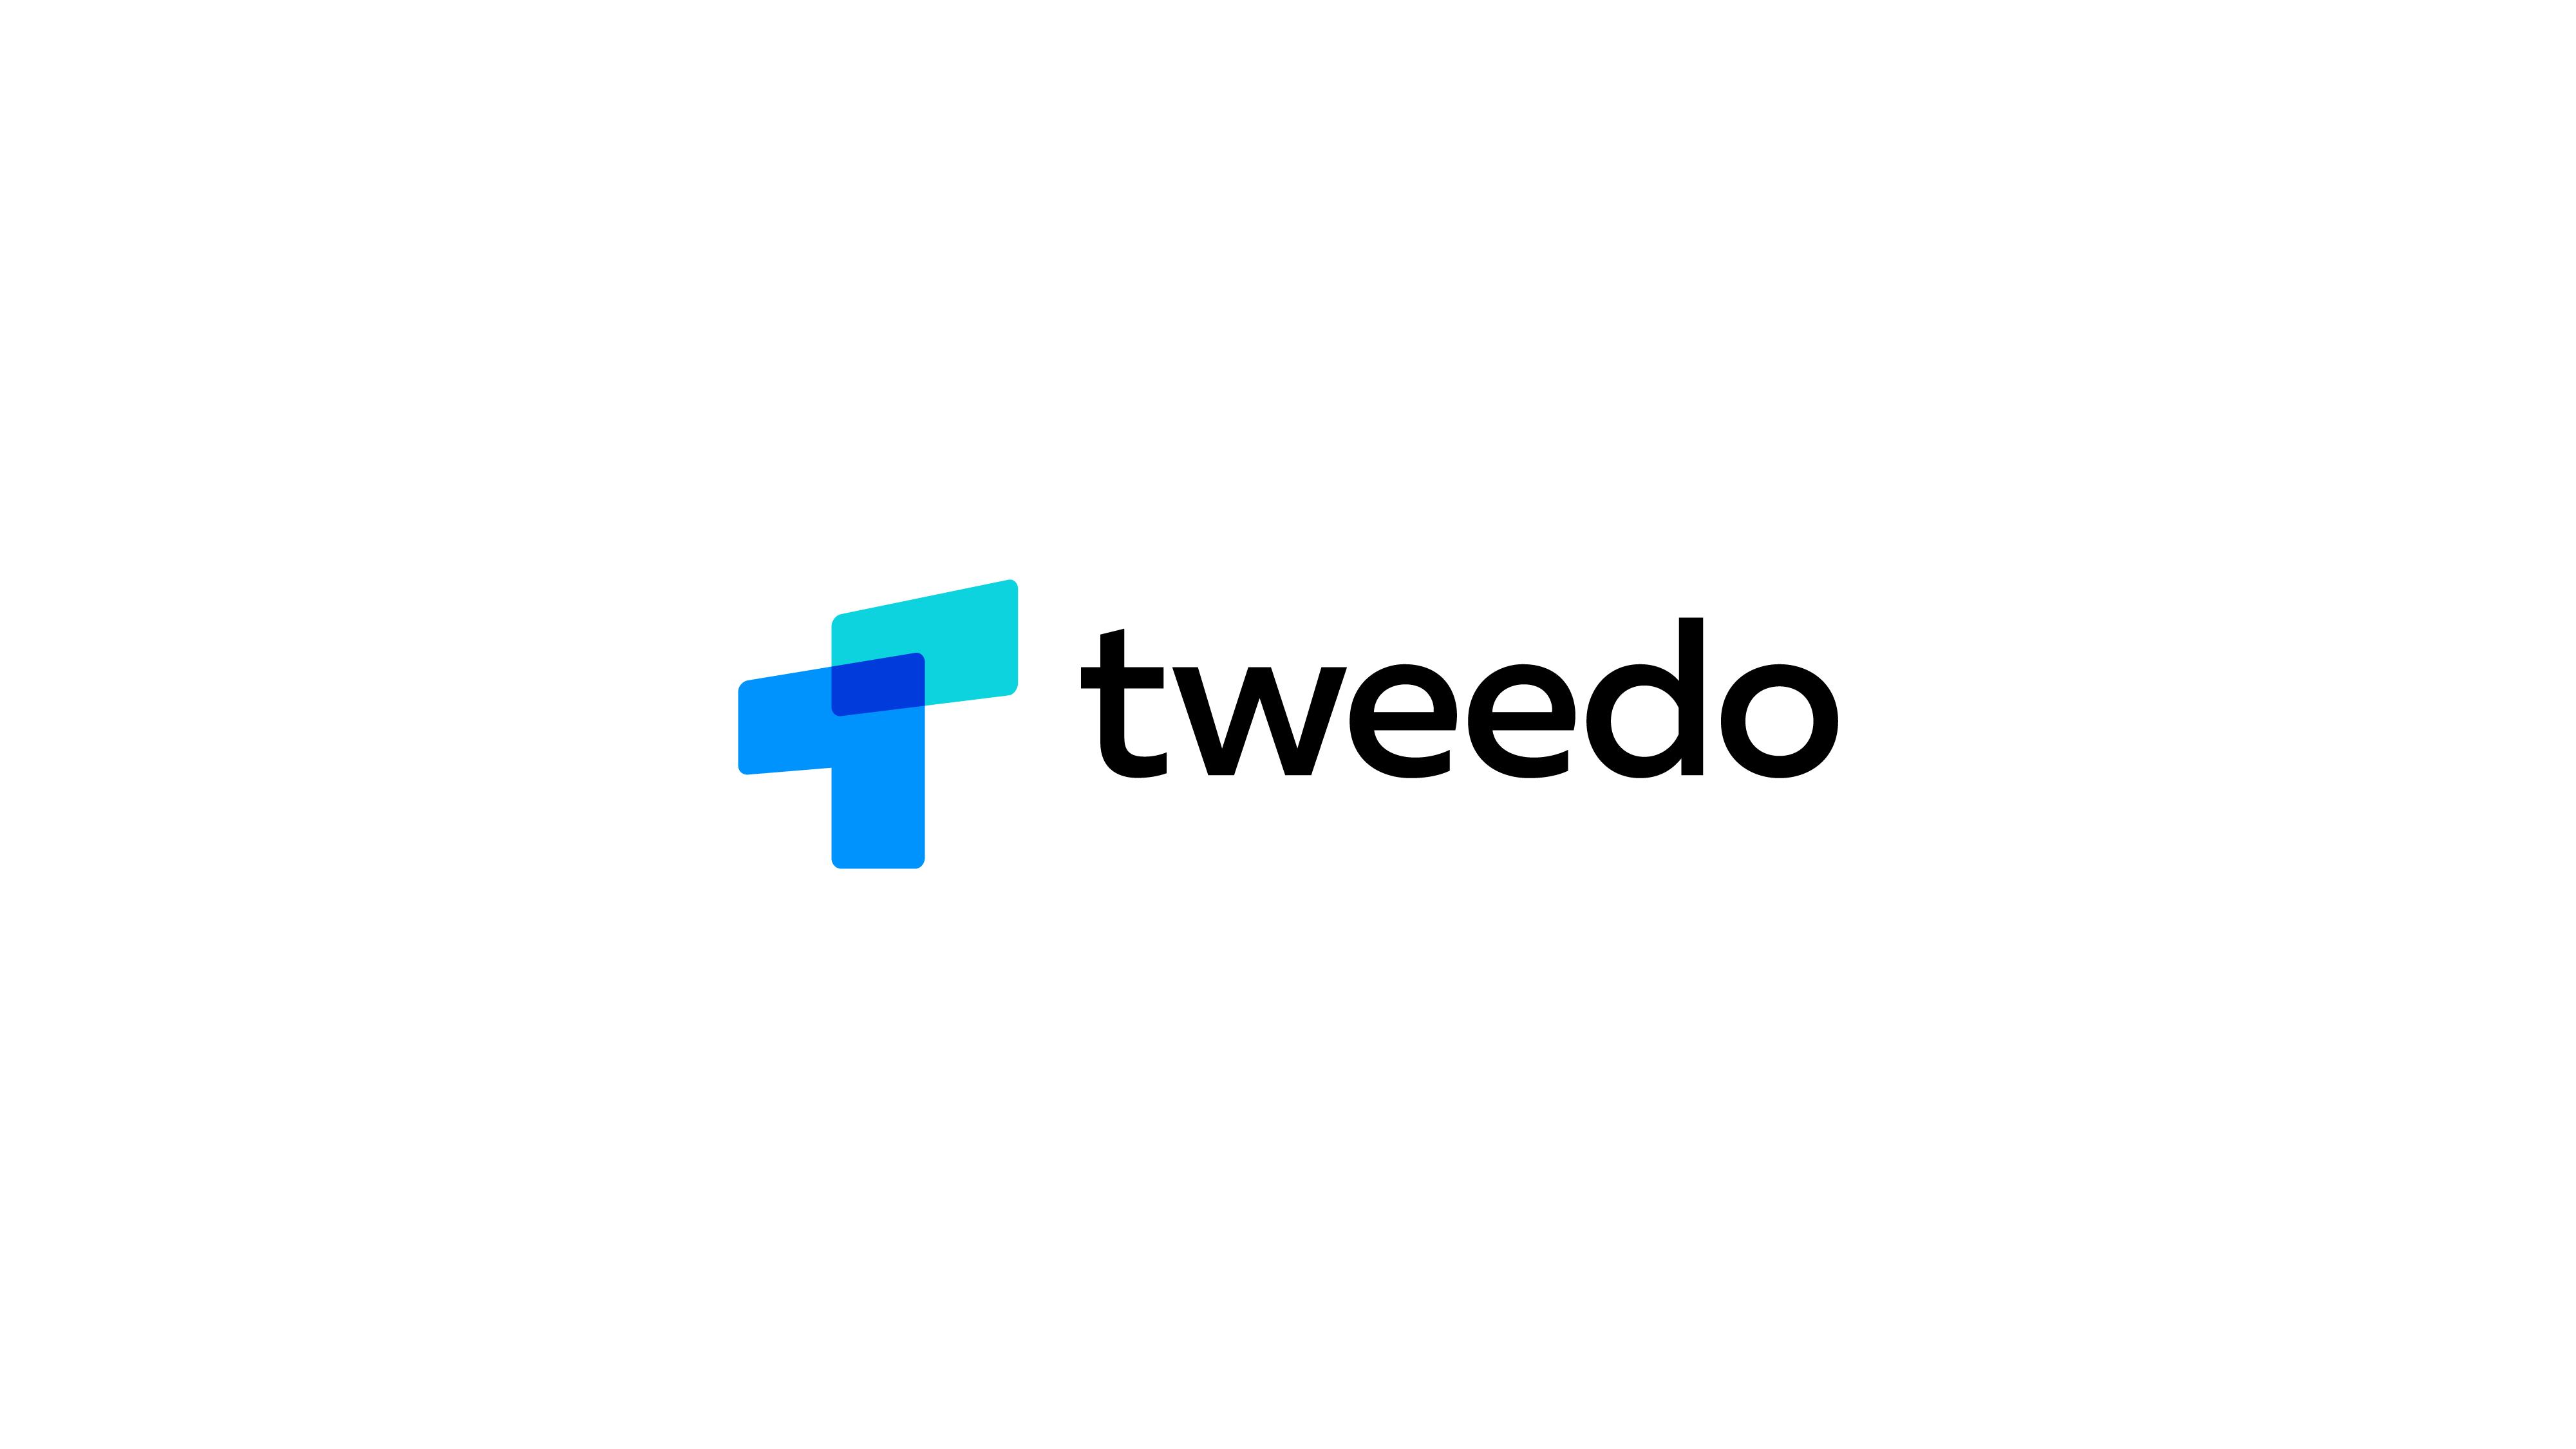 50_logos_1_T_tweedo_logo_design_brandforma